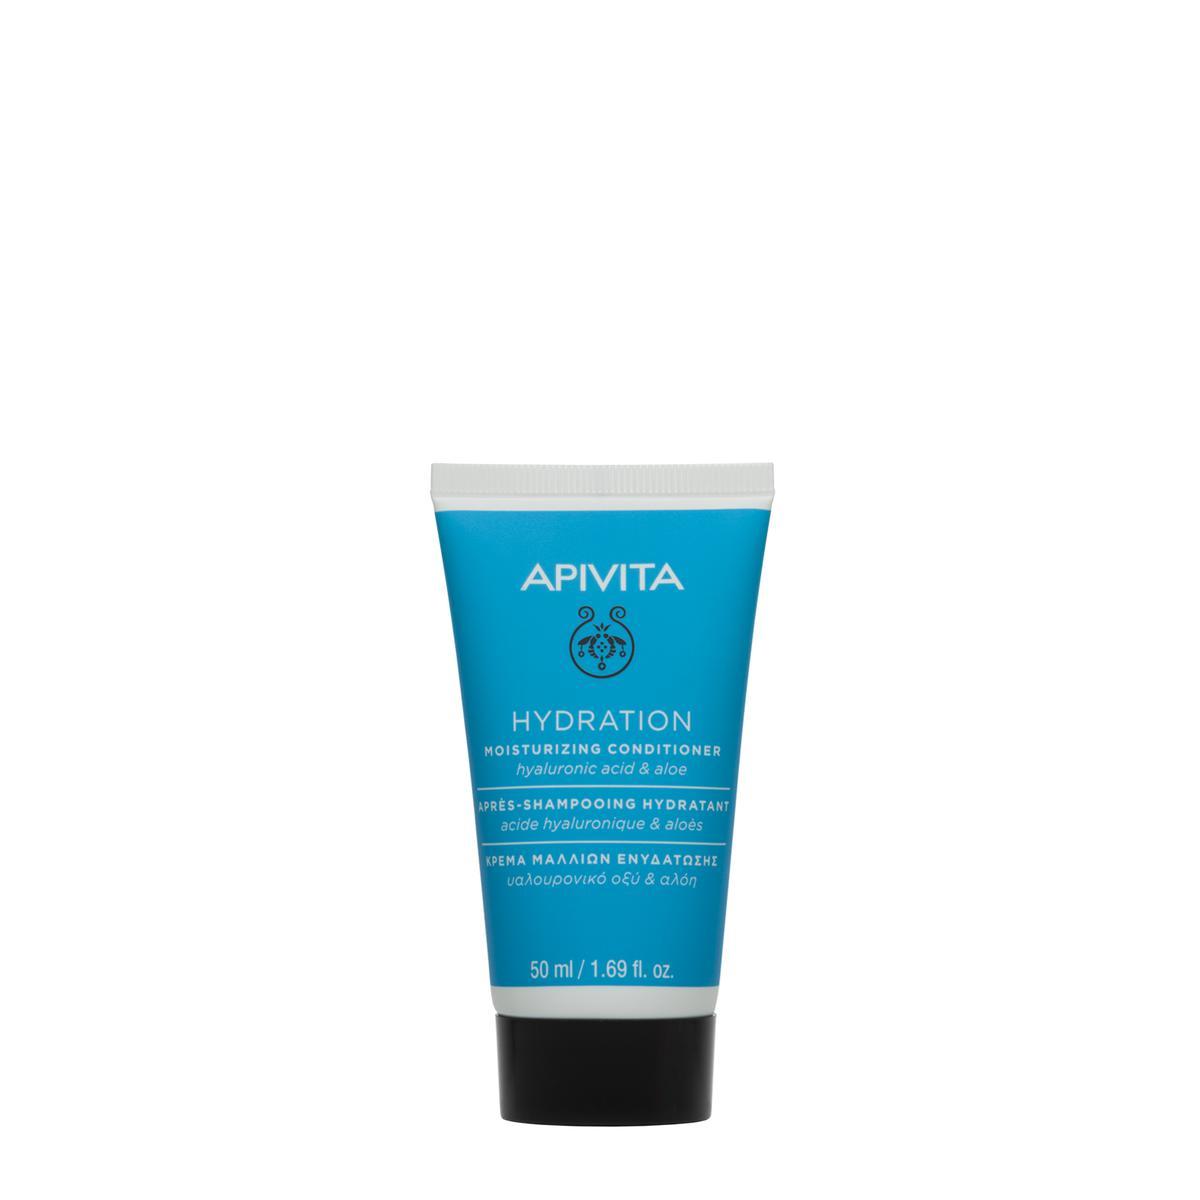 Mini Apres Shampoing Hydratant Pour Tous Types De Cheveux 50 Ml